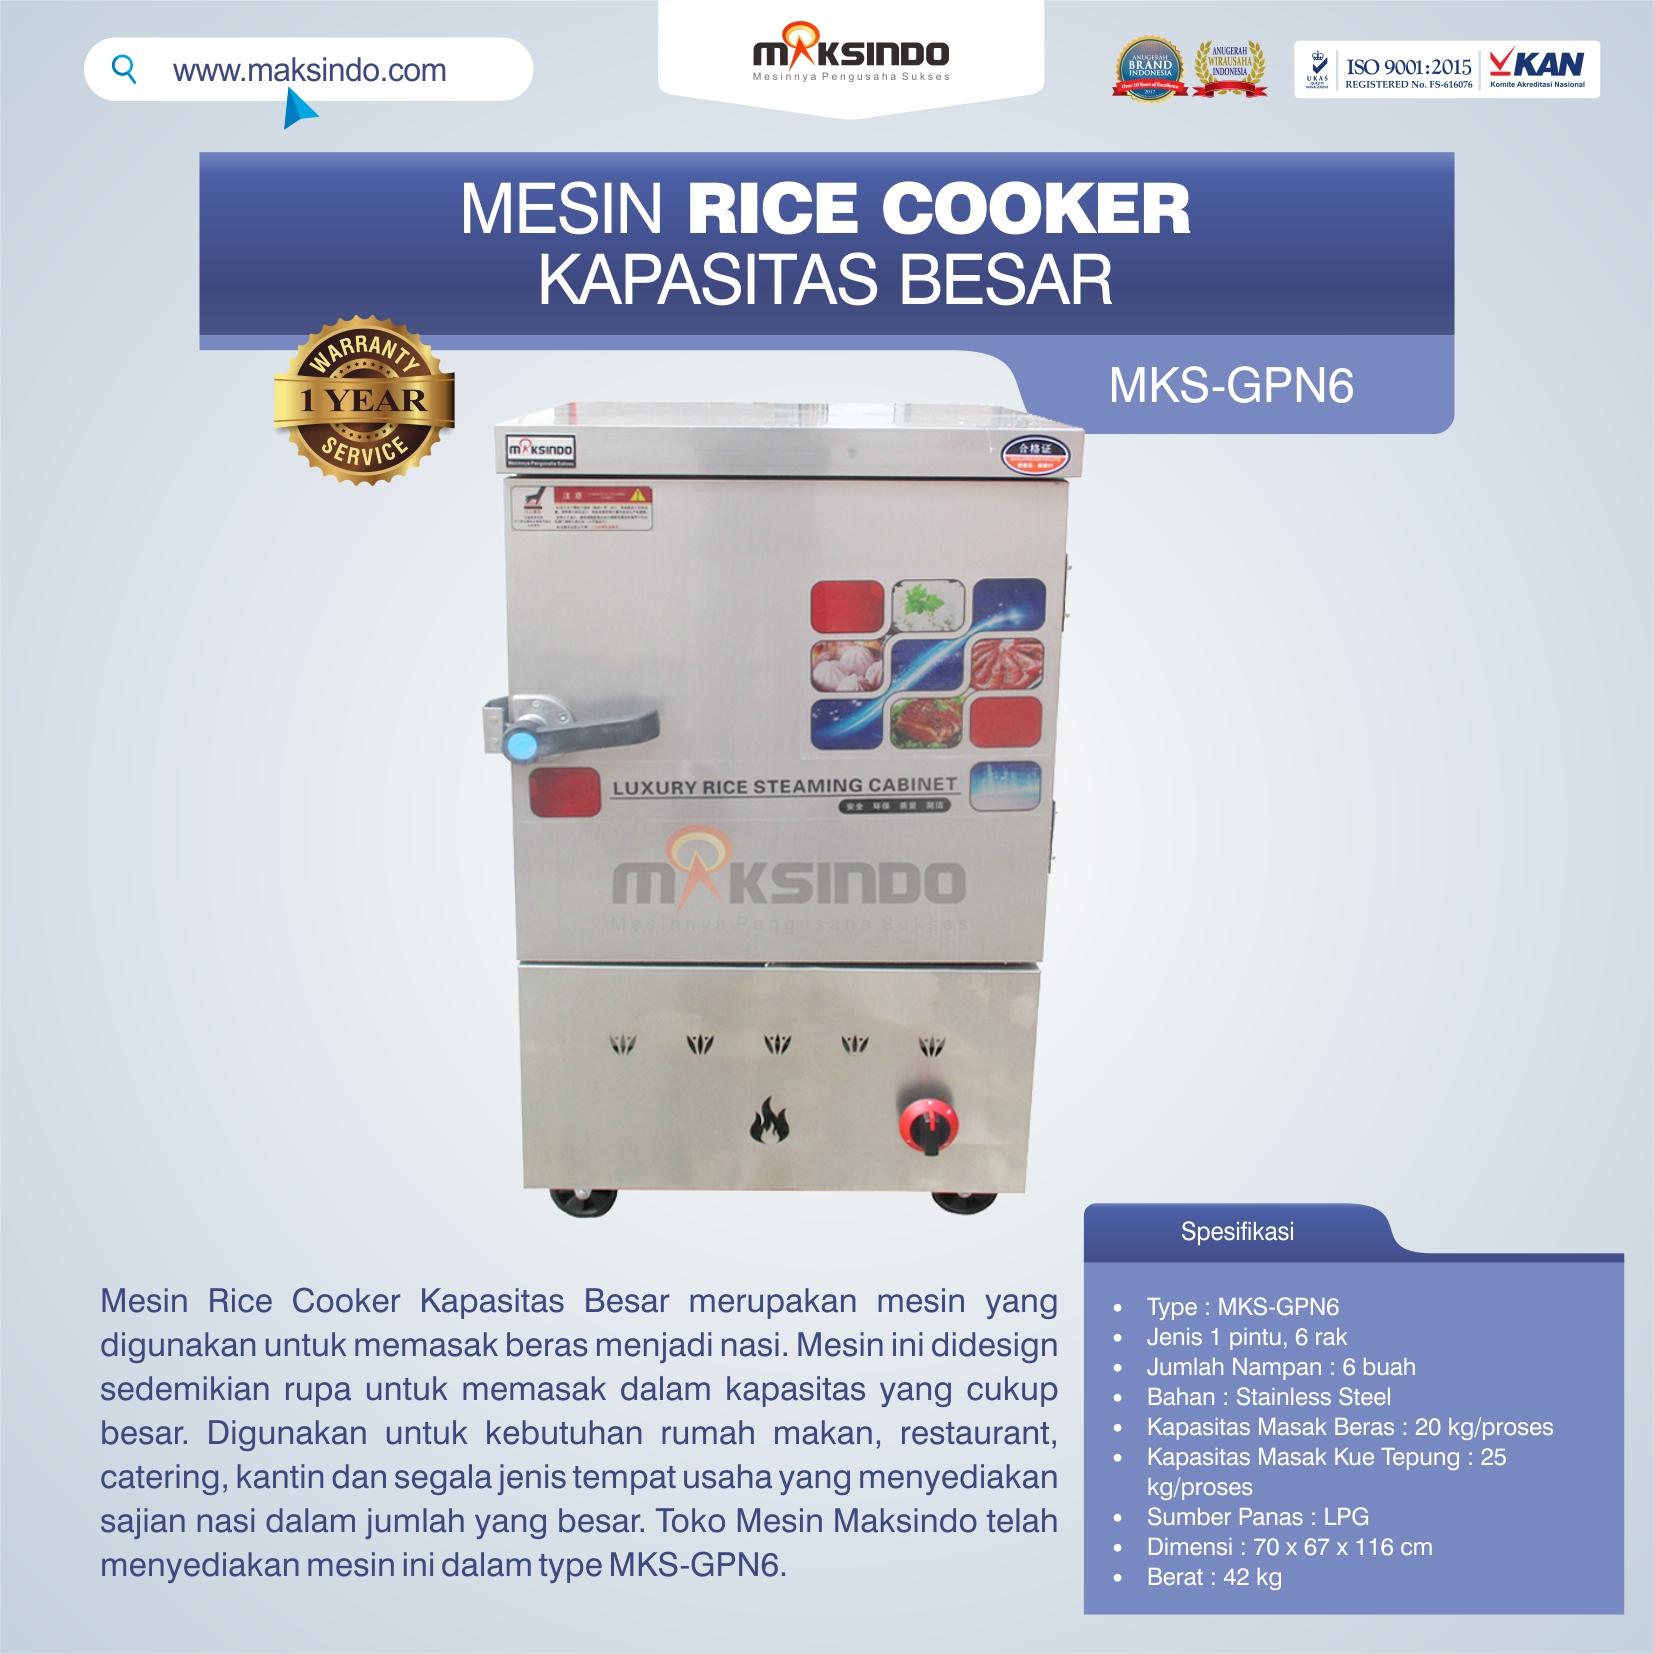 Mesin Rice Cooker Kapasitas Besar MKS-GPN6